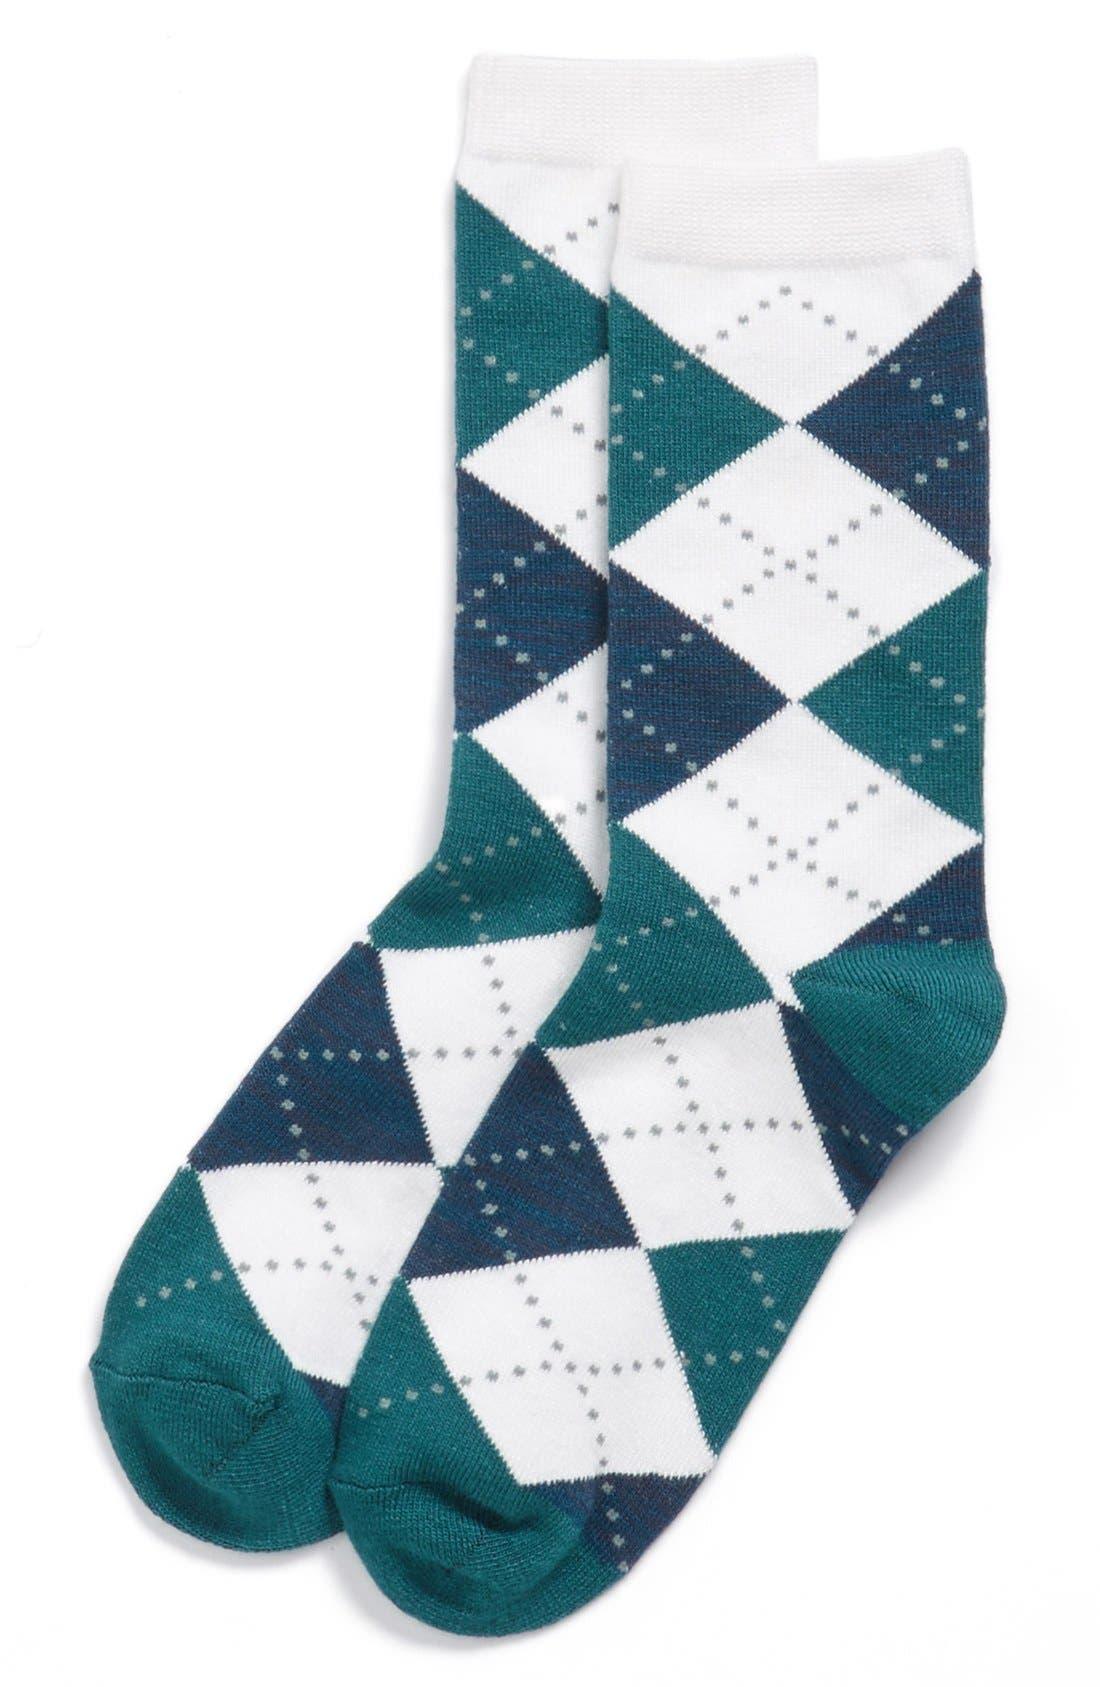 Alternate Image 1 Selected - Nordstrom 'Soft Touch' Argyle Crew Socks (3 for $18)